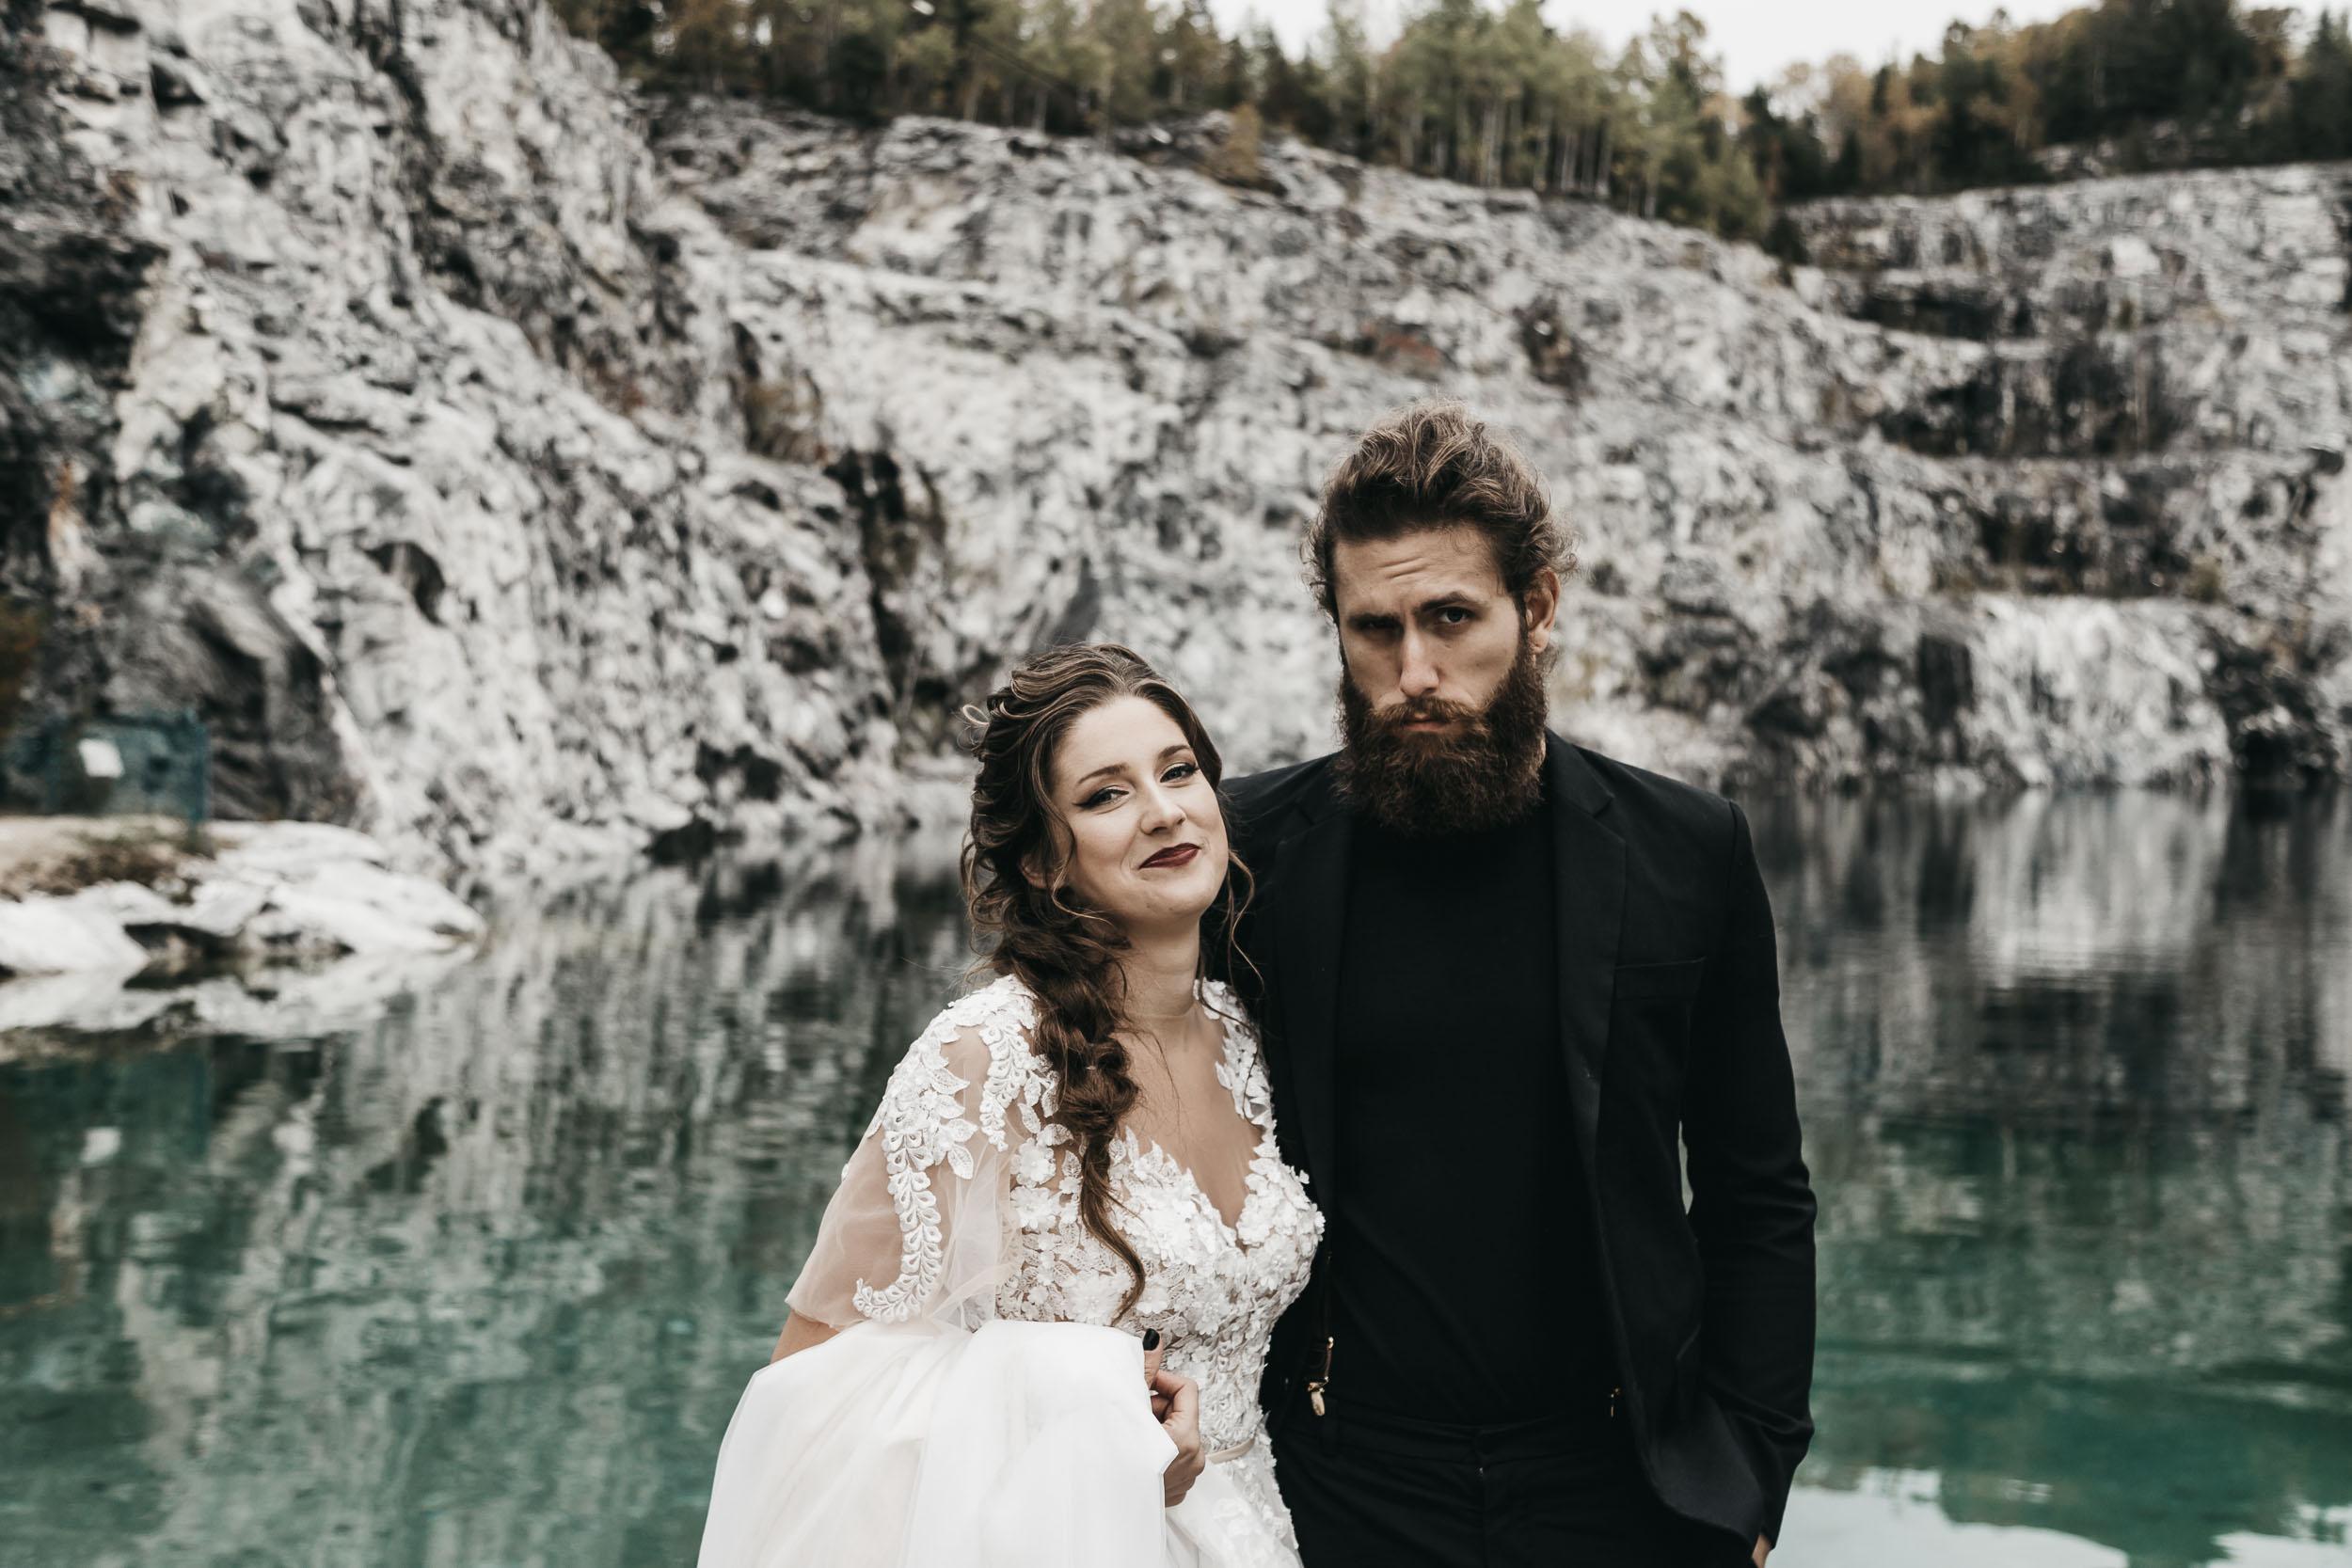 intimate-wedding-elopement-photographer-ottawa-toronto-0273.jpg